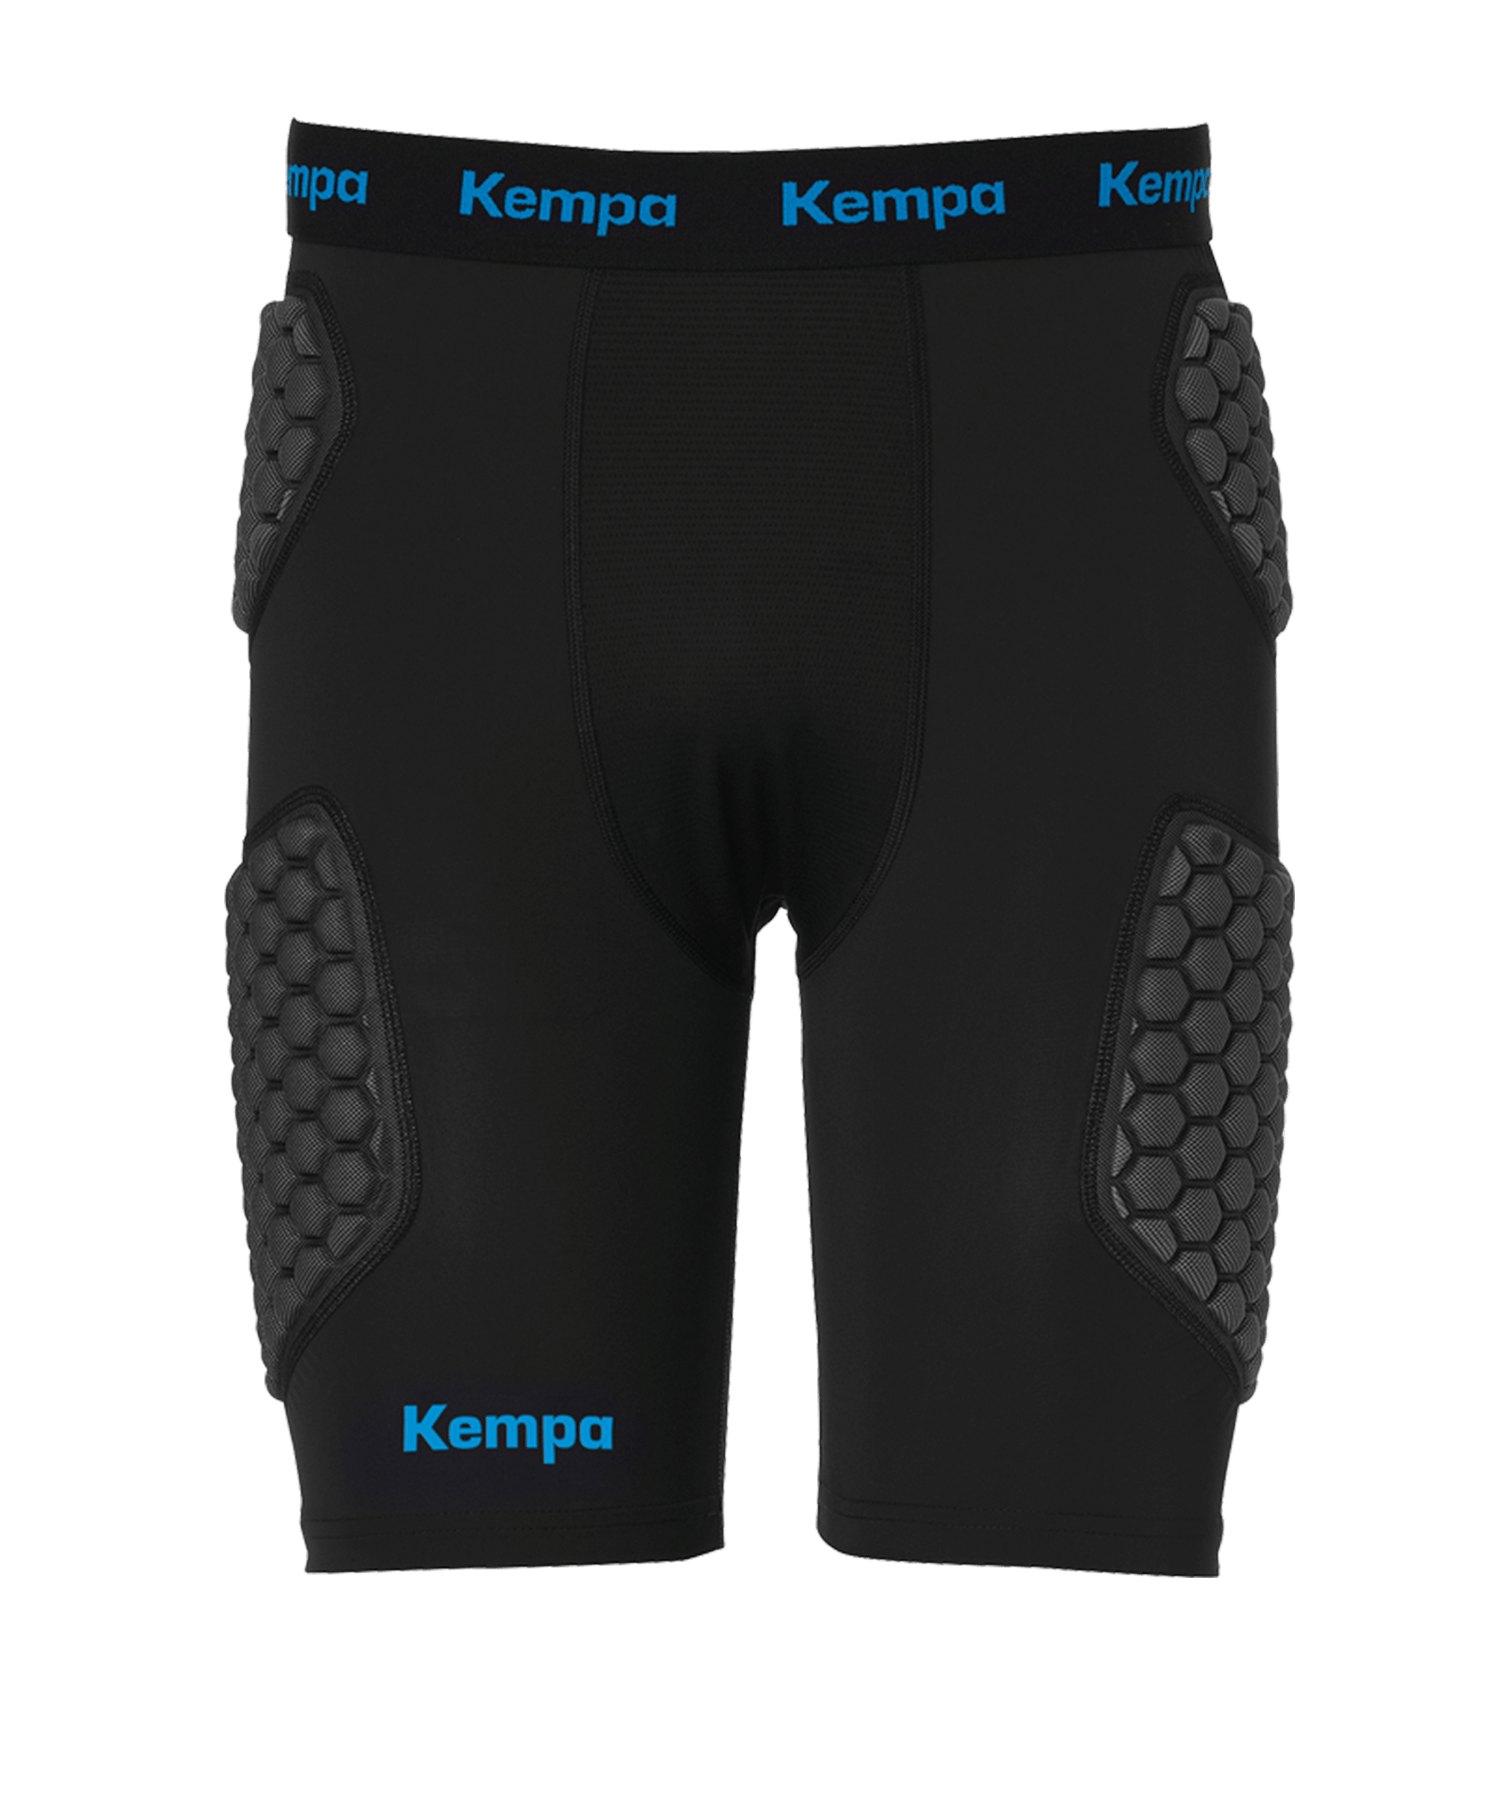 Kempa Protection Torwartshort Schwarz F01 - schwarz